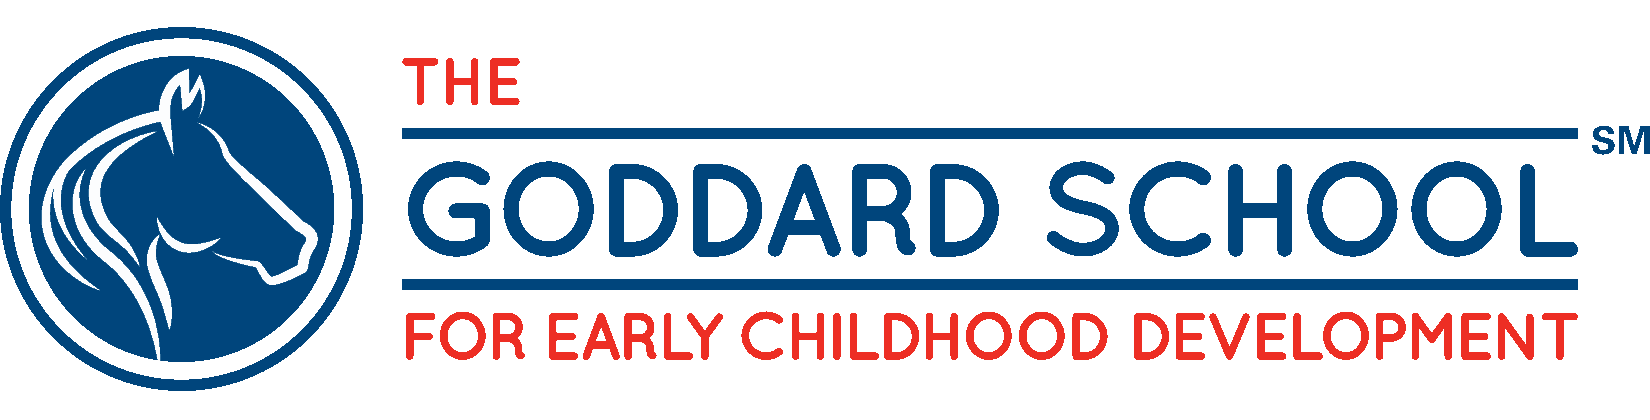 GoddardLogo-1.png